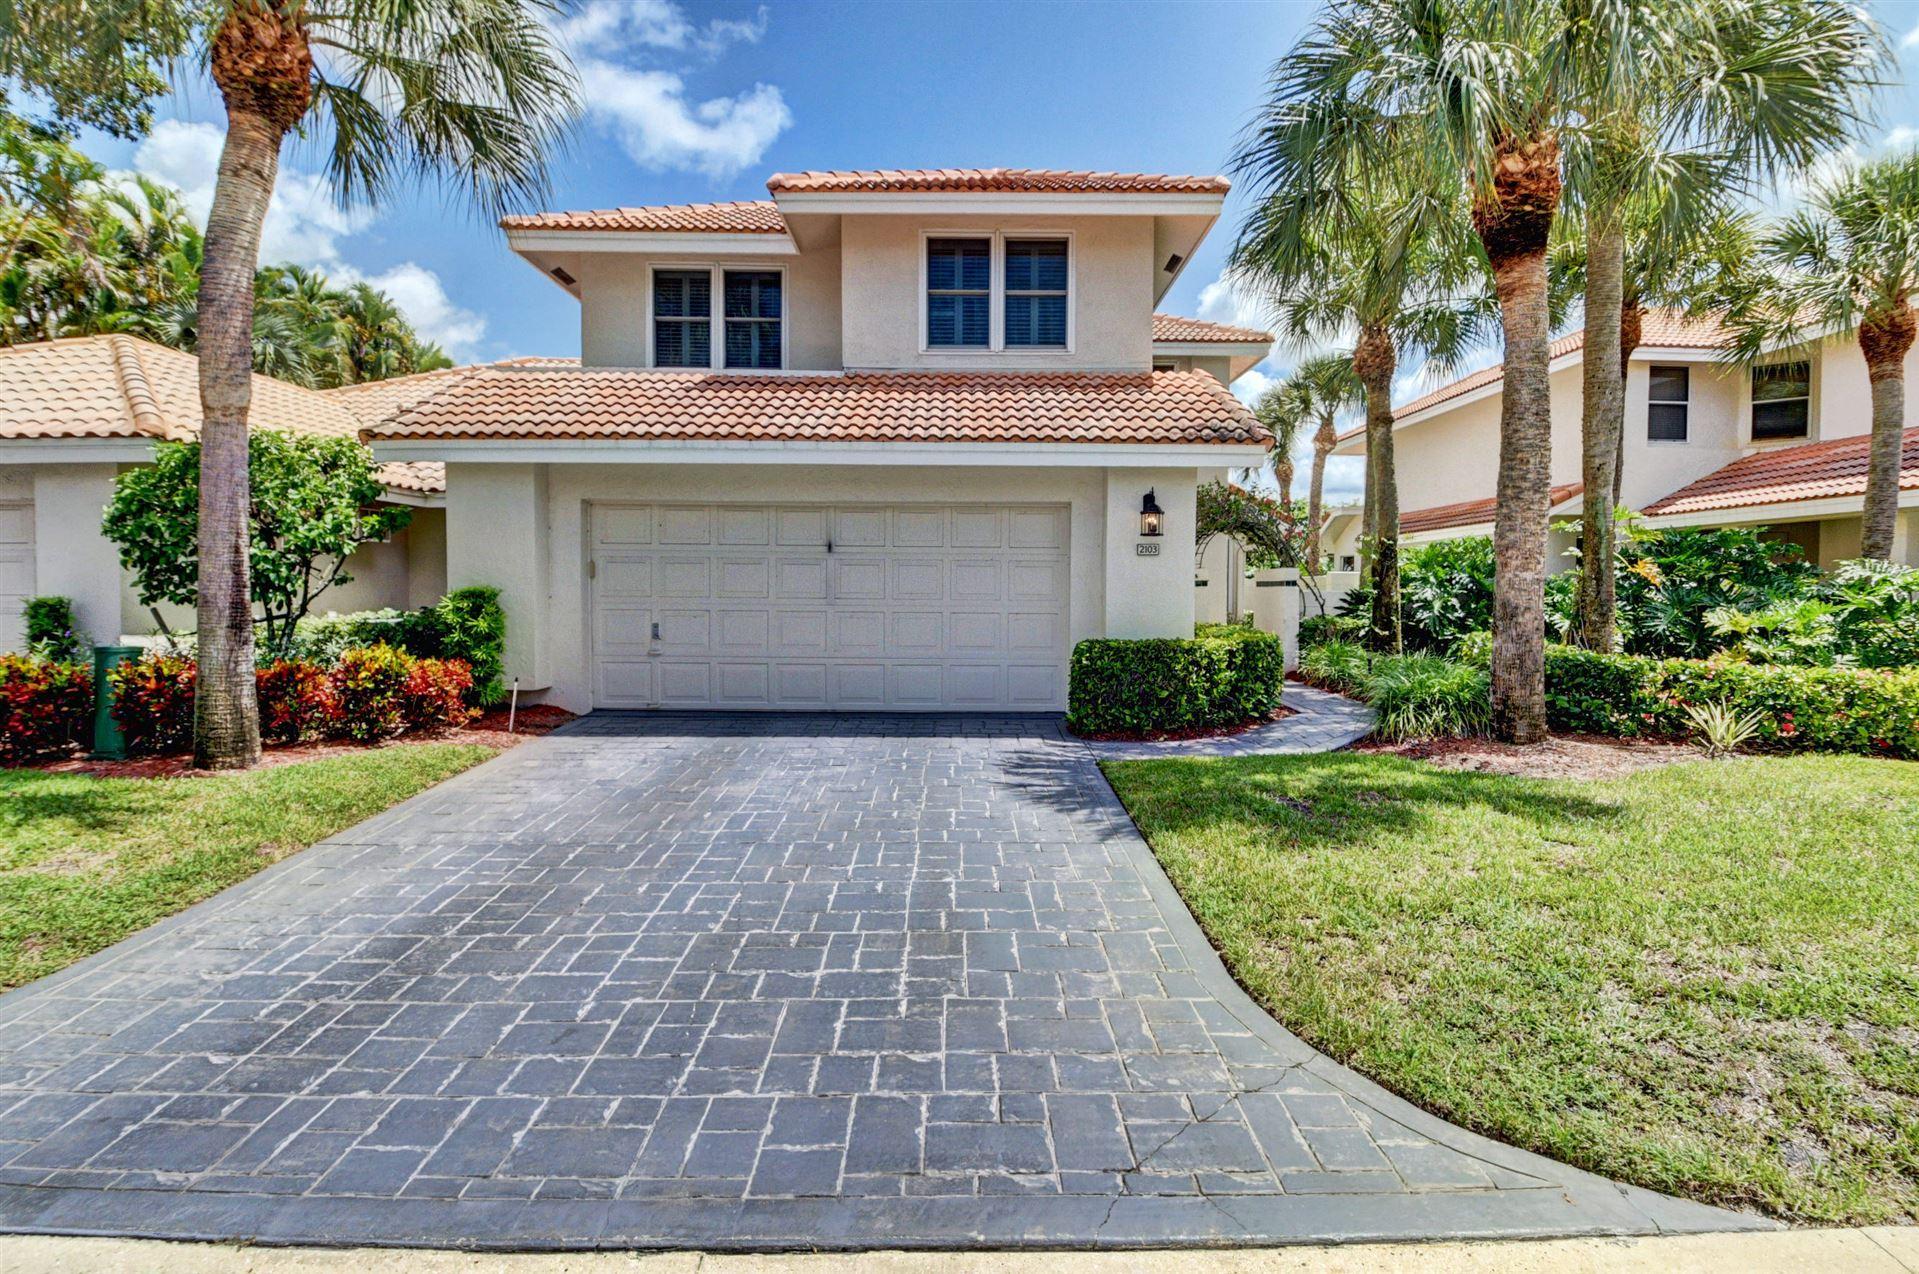 2103 NW 53rd Street, Boca Raton, FL 33496 - #: RX-10553242